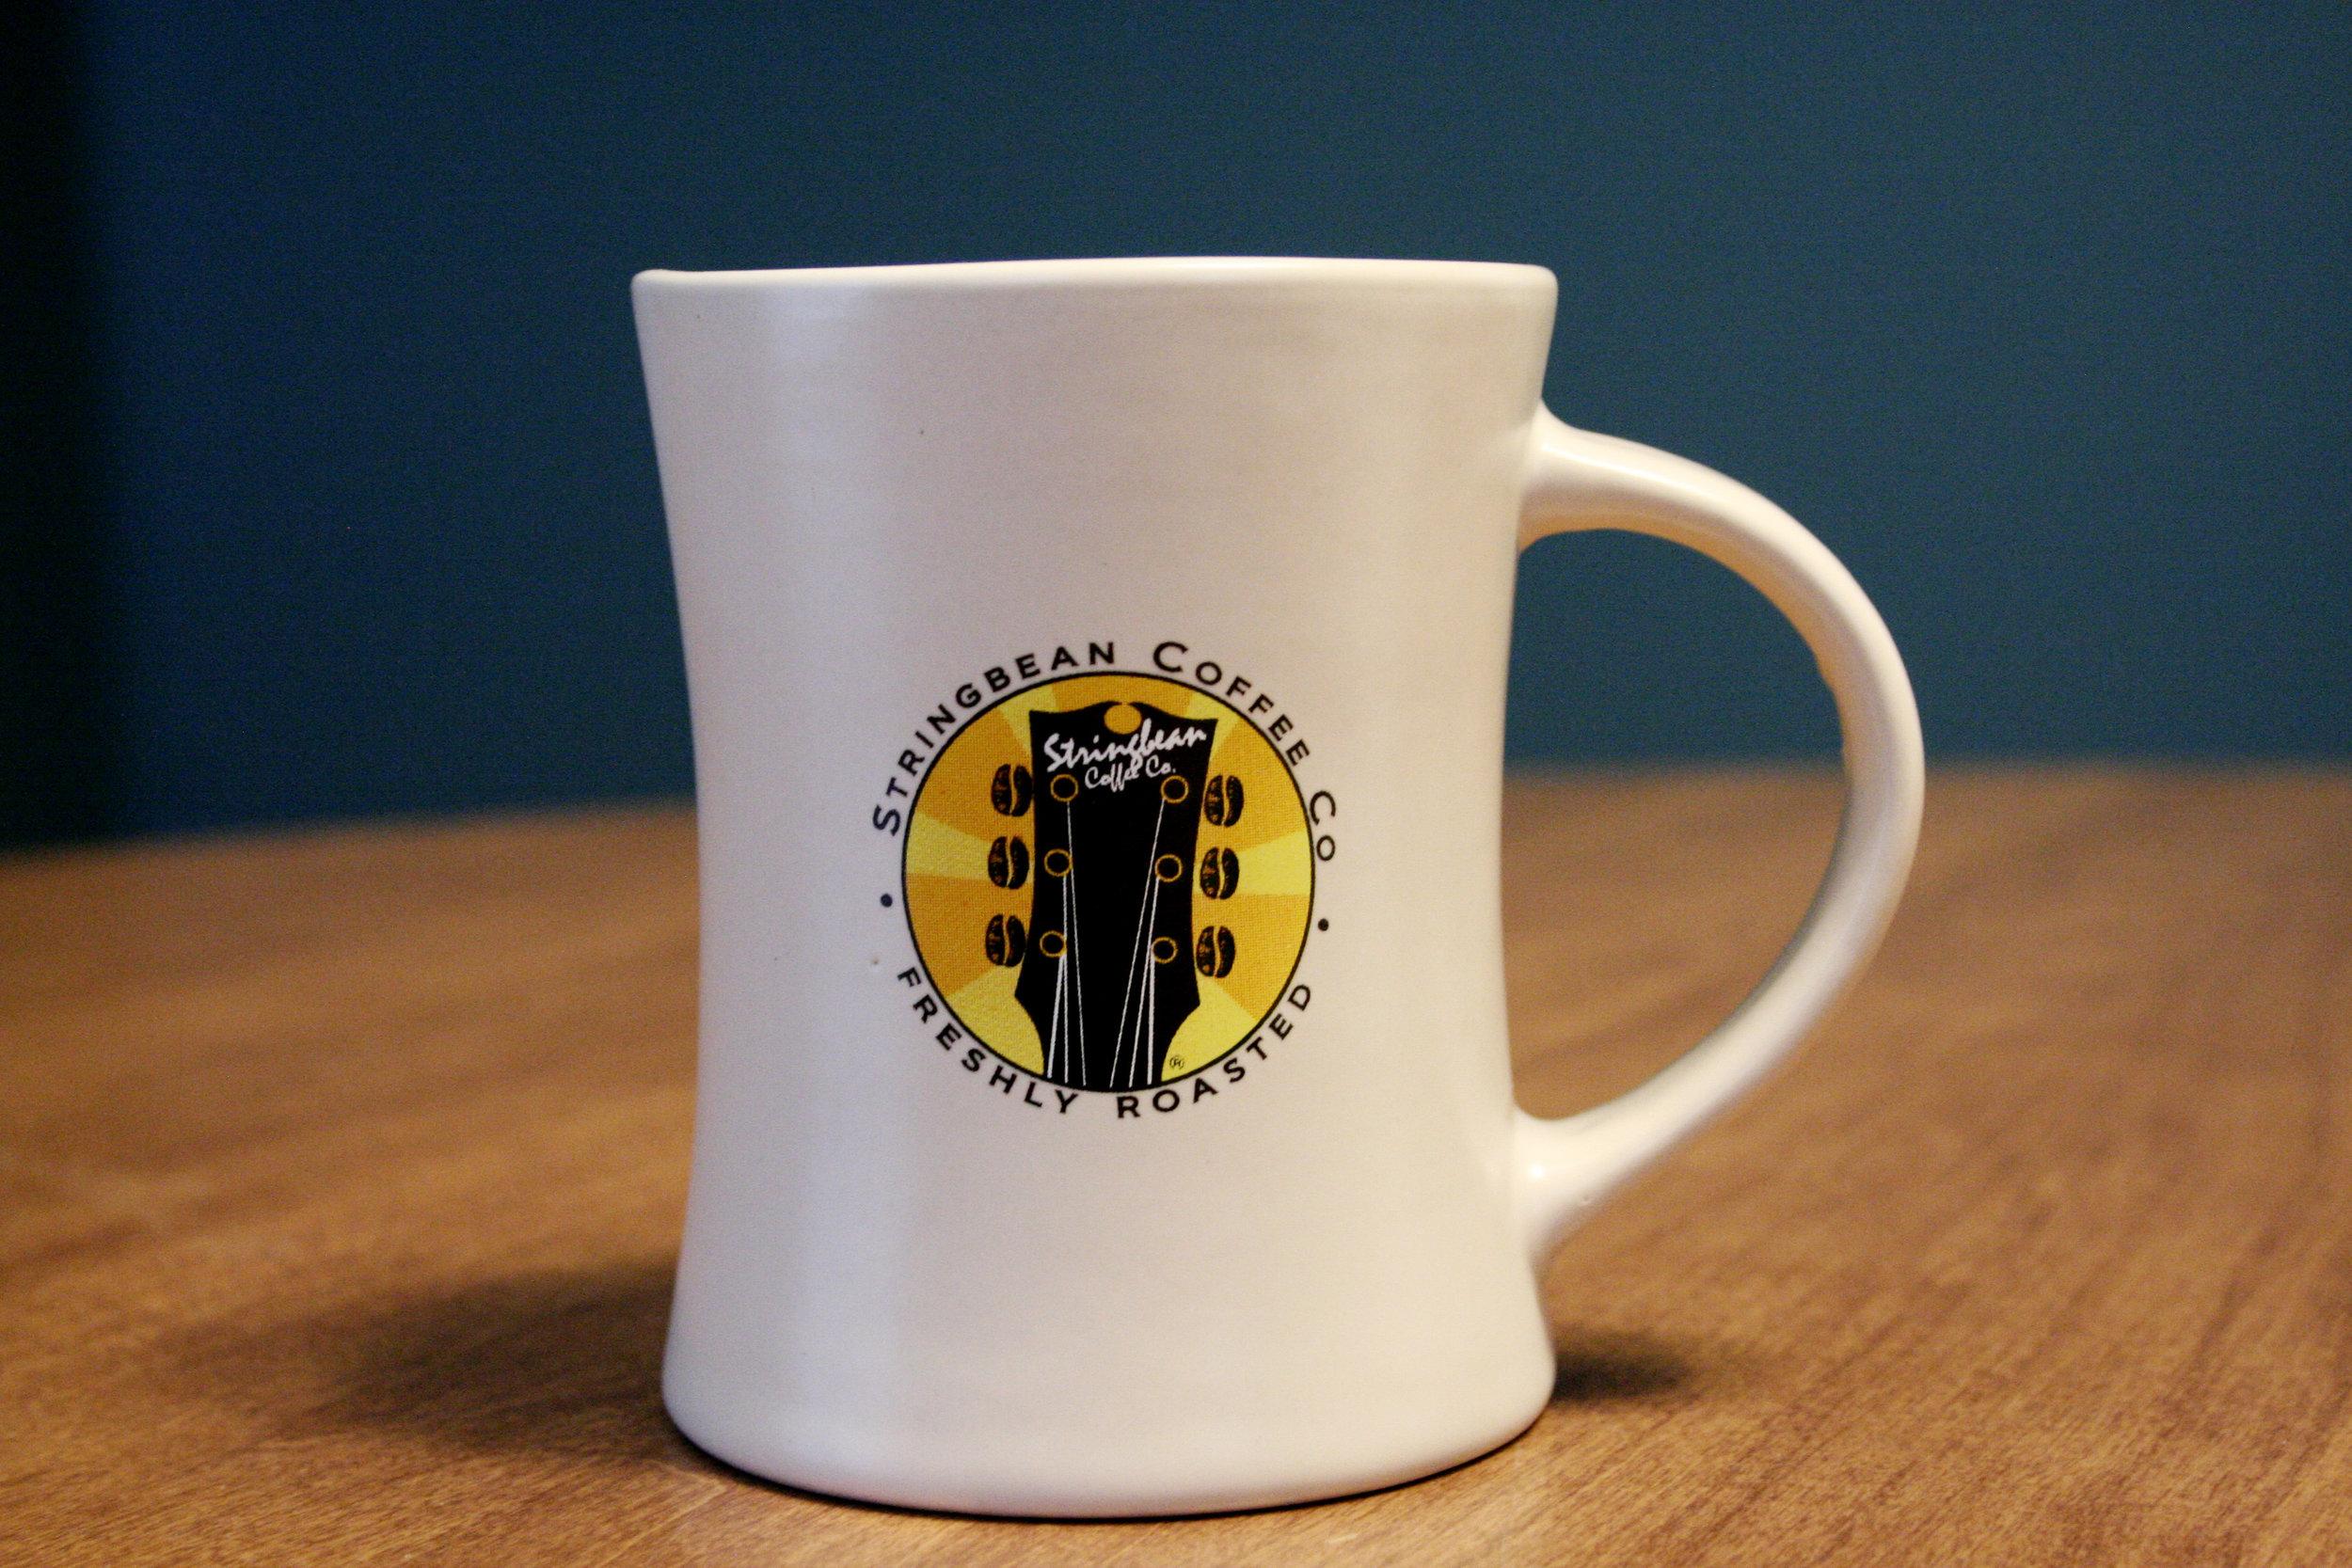 A coffee mug from Stringbean Coffee Company in St. Louis, Missouri.